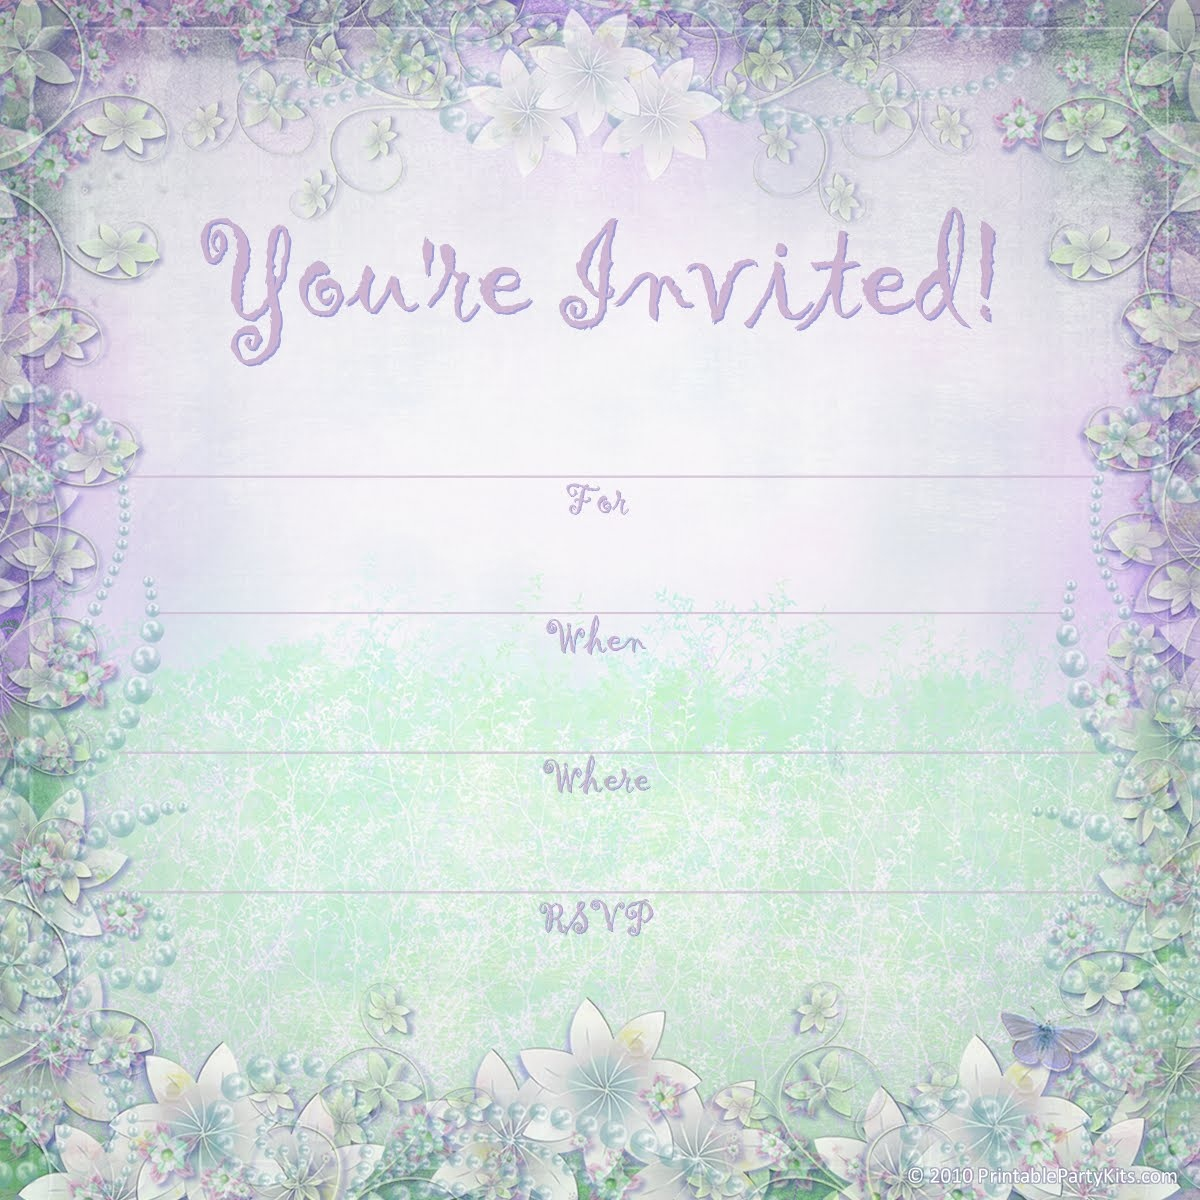 97+ 16Th Birthday Invites Templates - 16Th Birthday Invitations Q0D4 - Free Printable 16Th Birthday Party Invitation Templates